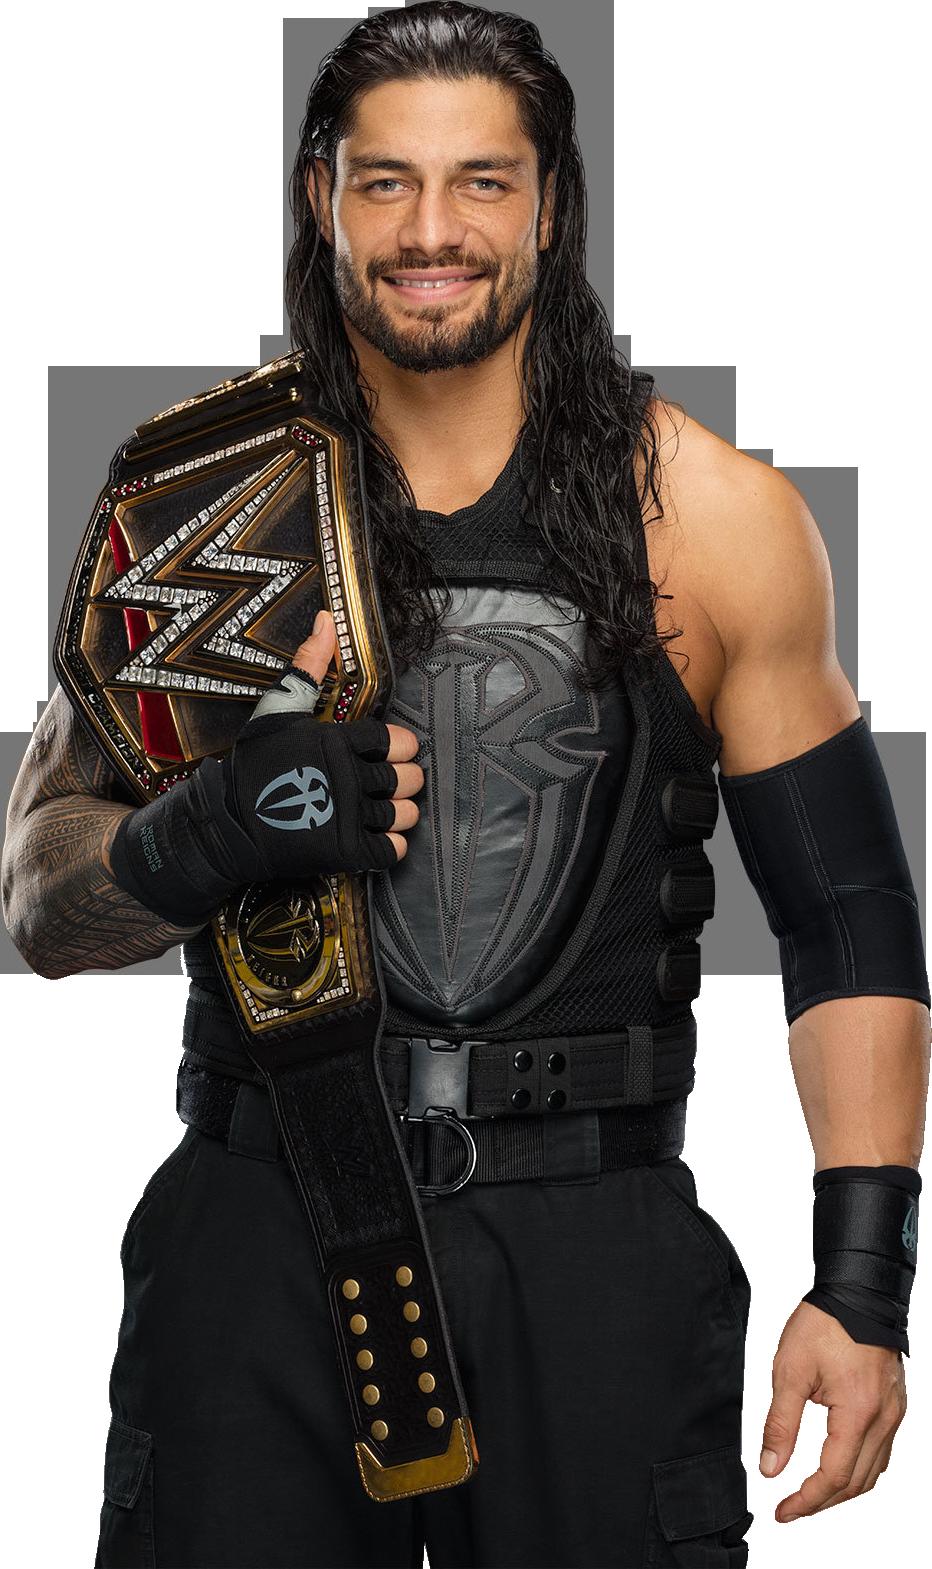 . PlusPng.com AmbriegnsAsylum16 Roman Reigns WWE Champion 2015 PNG by  AmbriegnsAsylum16 - Wwi PNG HD